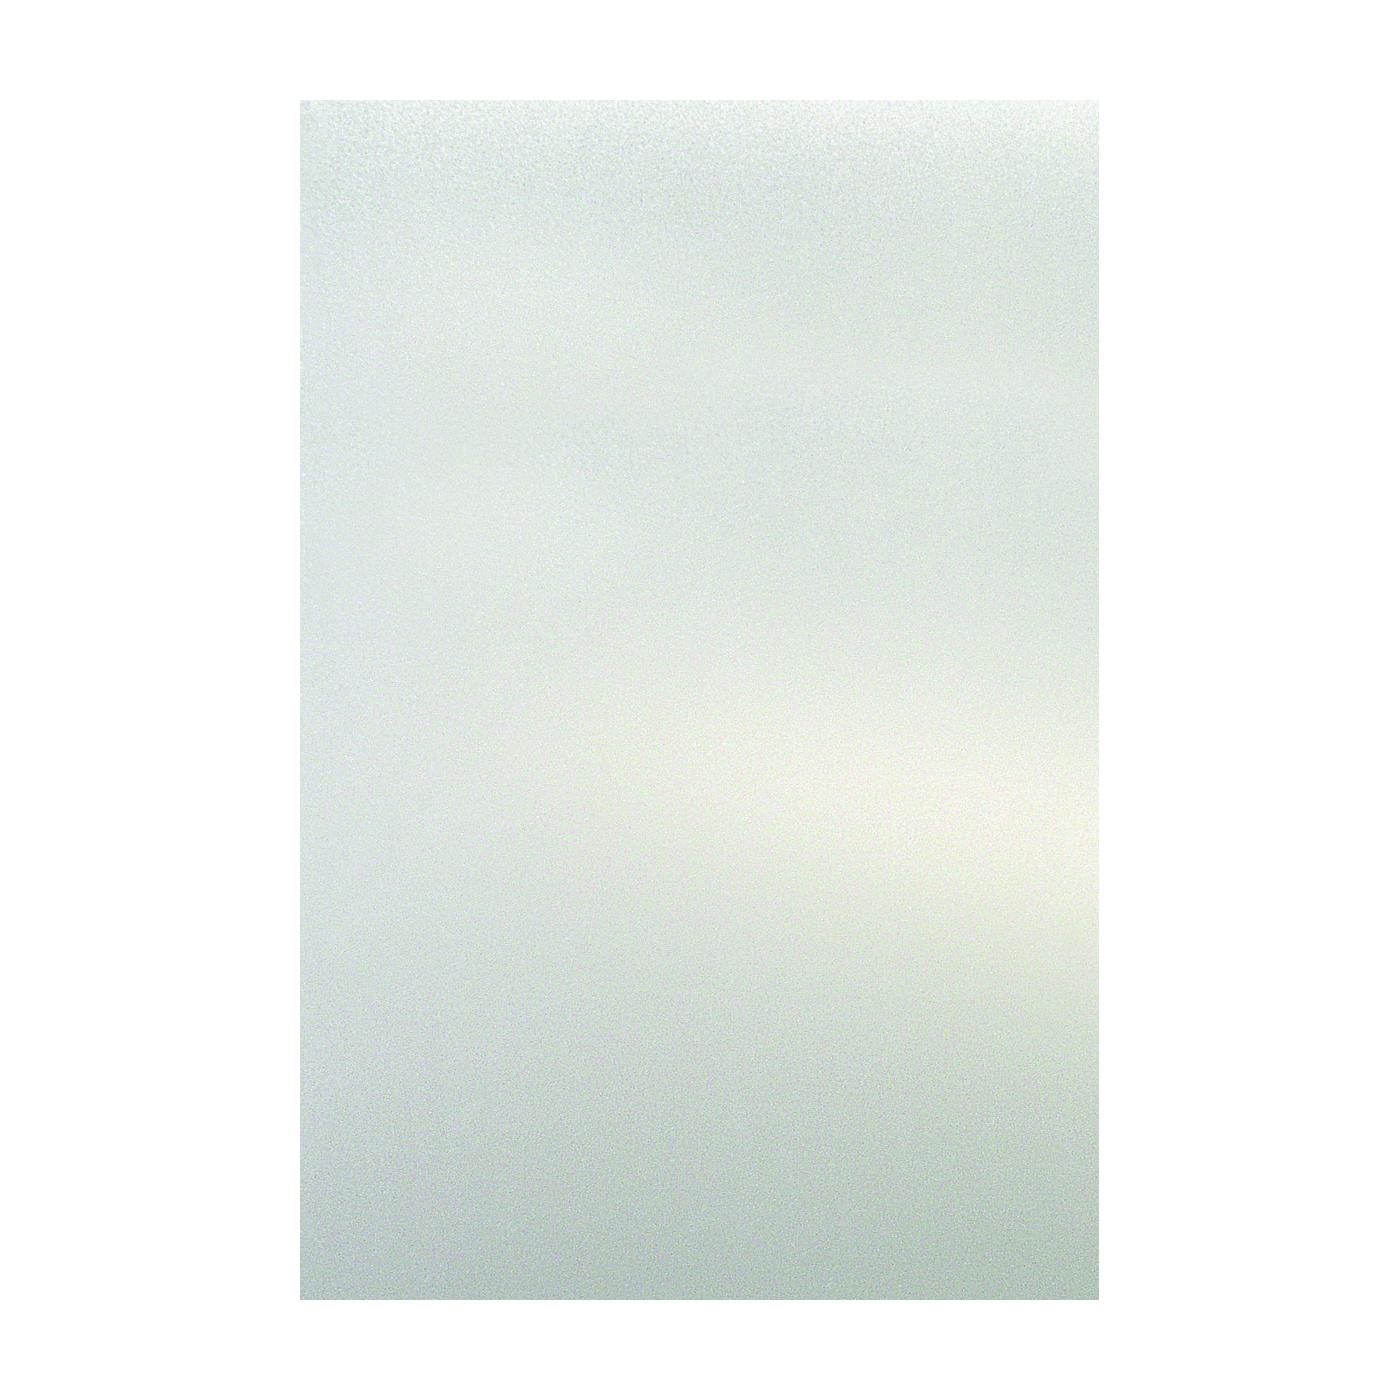 ARTSCAPE 01-0121